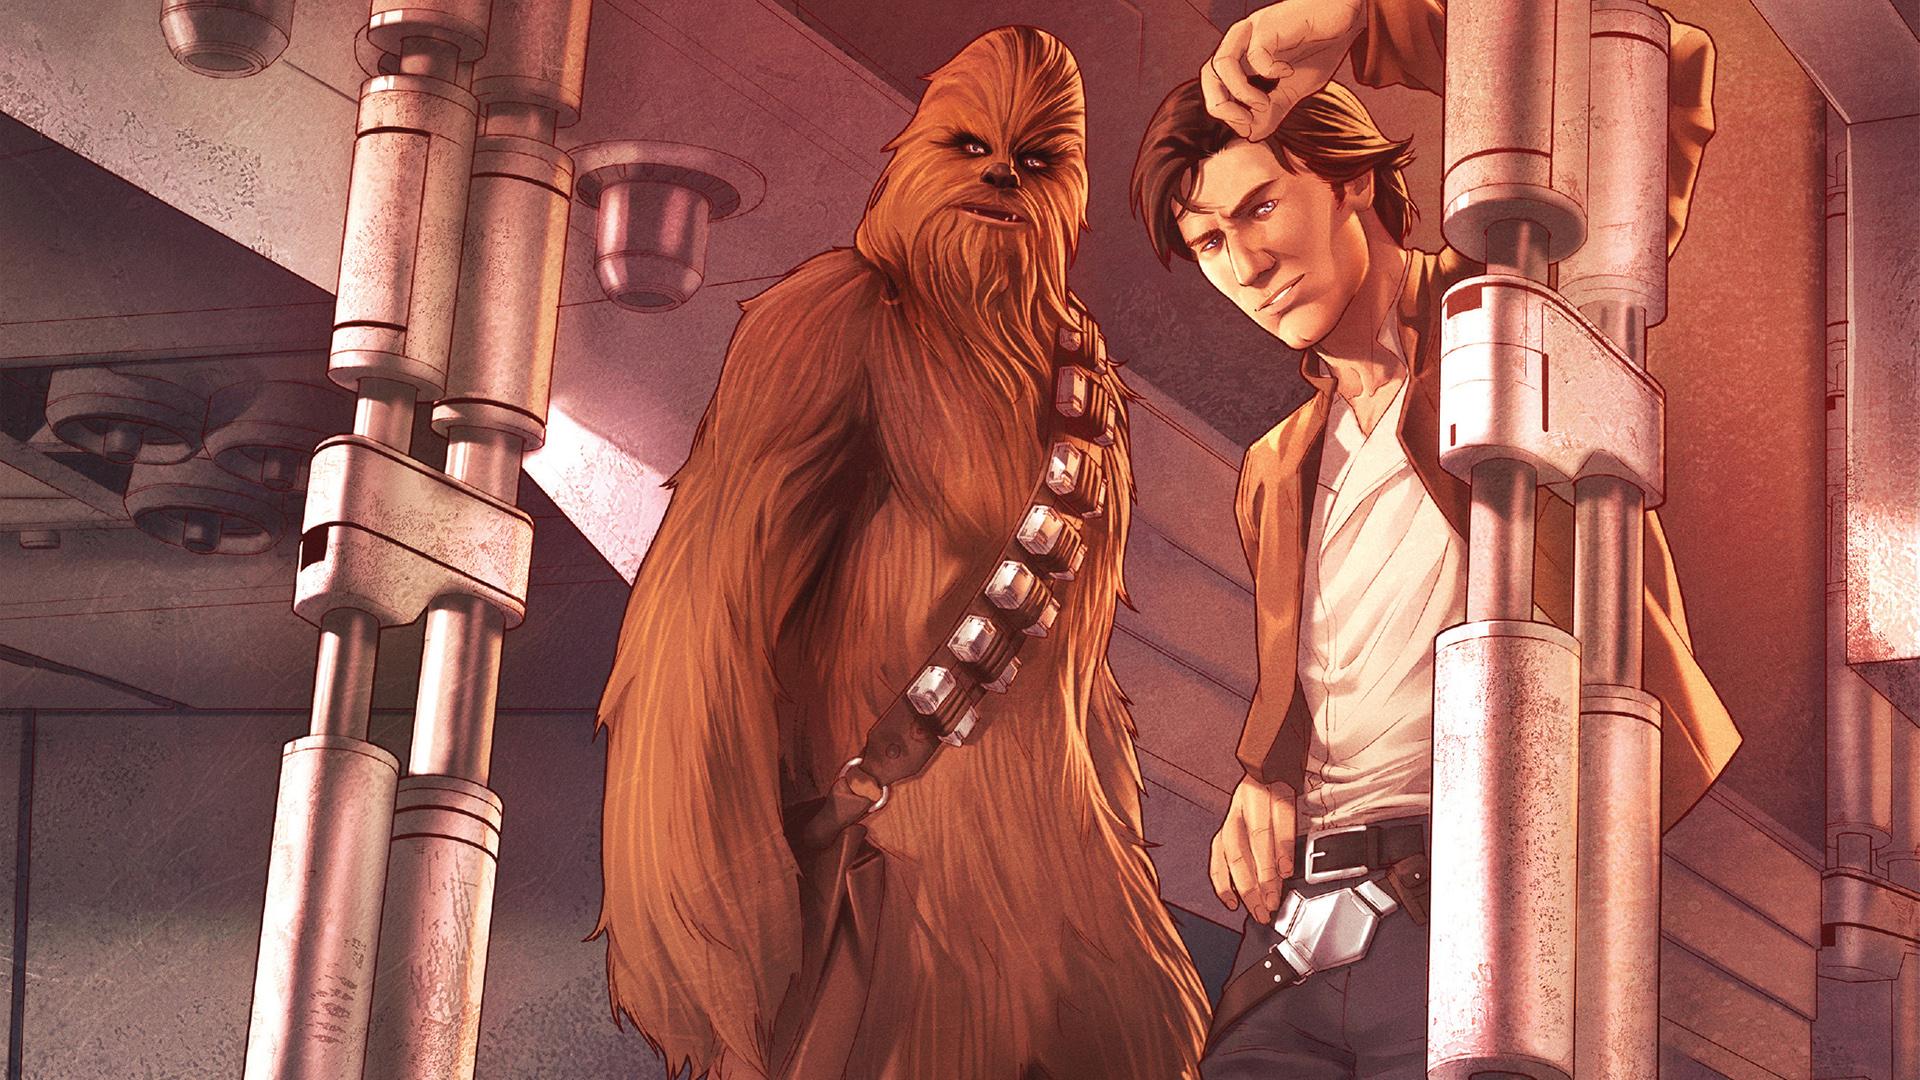 Star Wars Han Solo And Chewbacca Wallpaper Hd Superheroes 4k